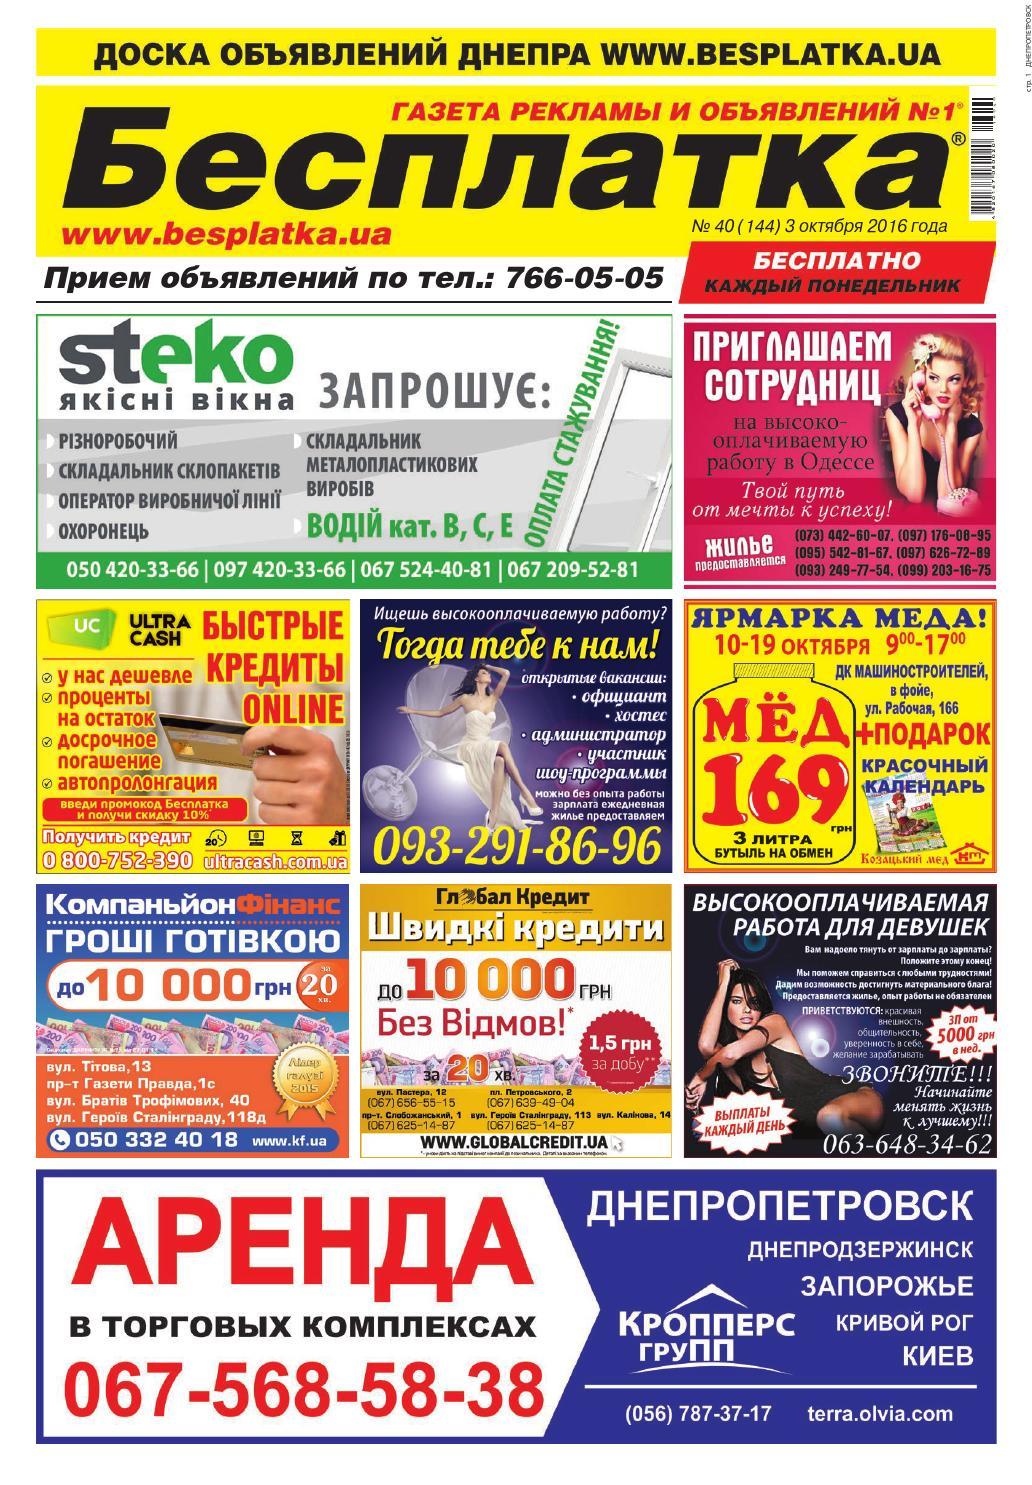 7ce04f74b05b Besplatka  40 Днепр by besplatka ukraine - issuu